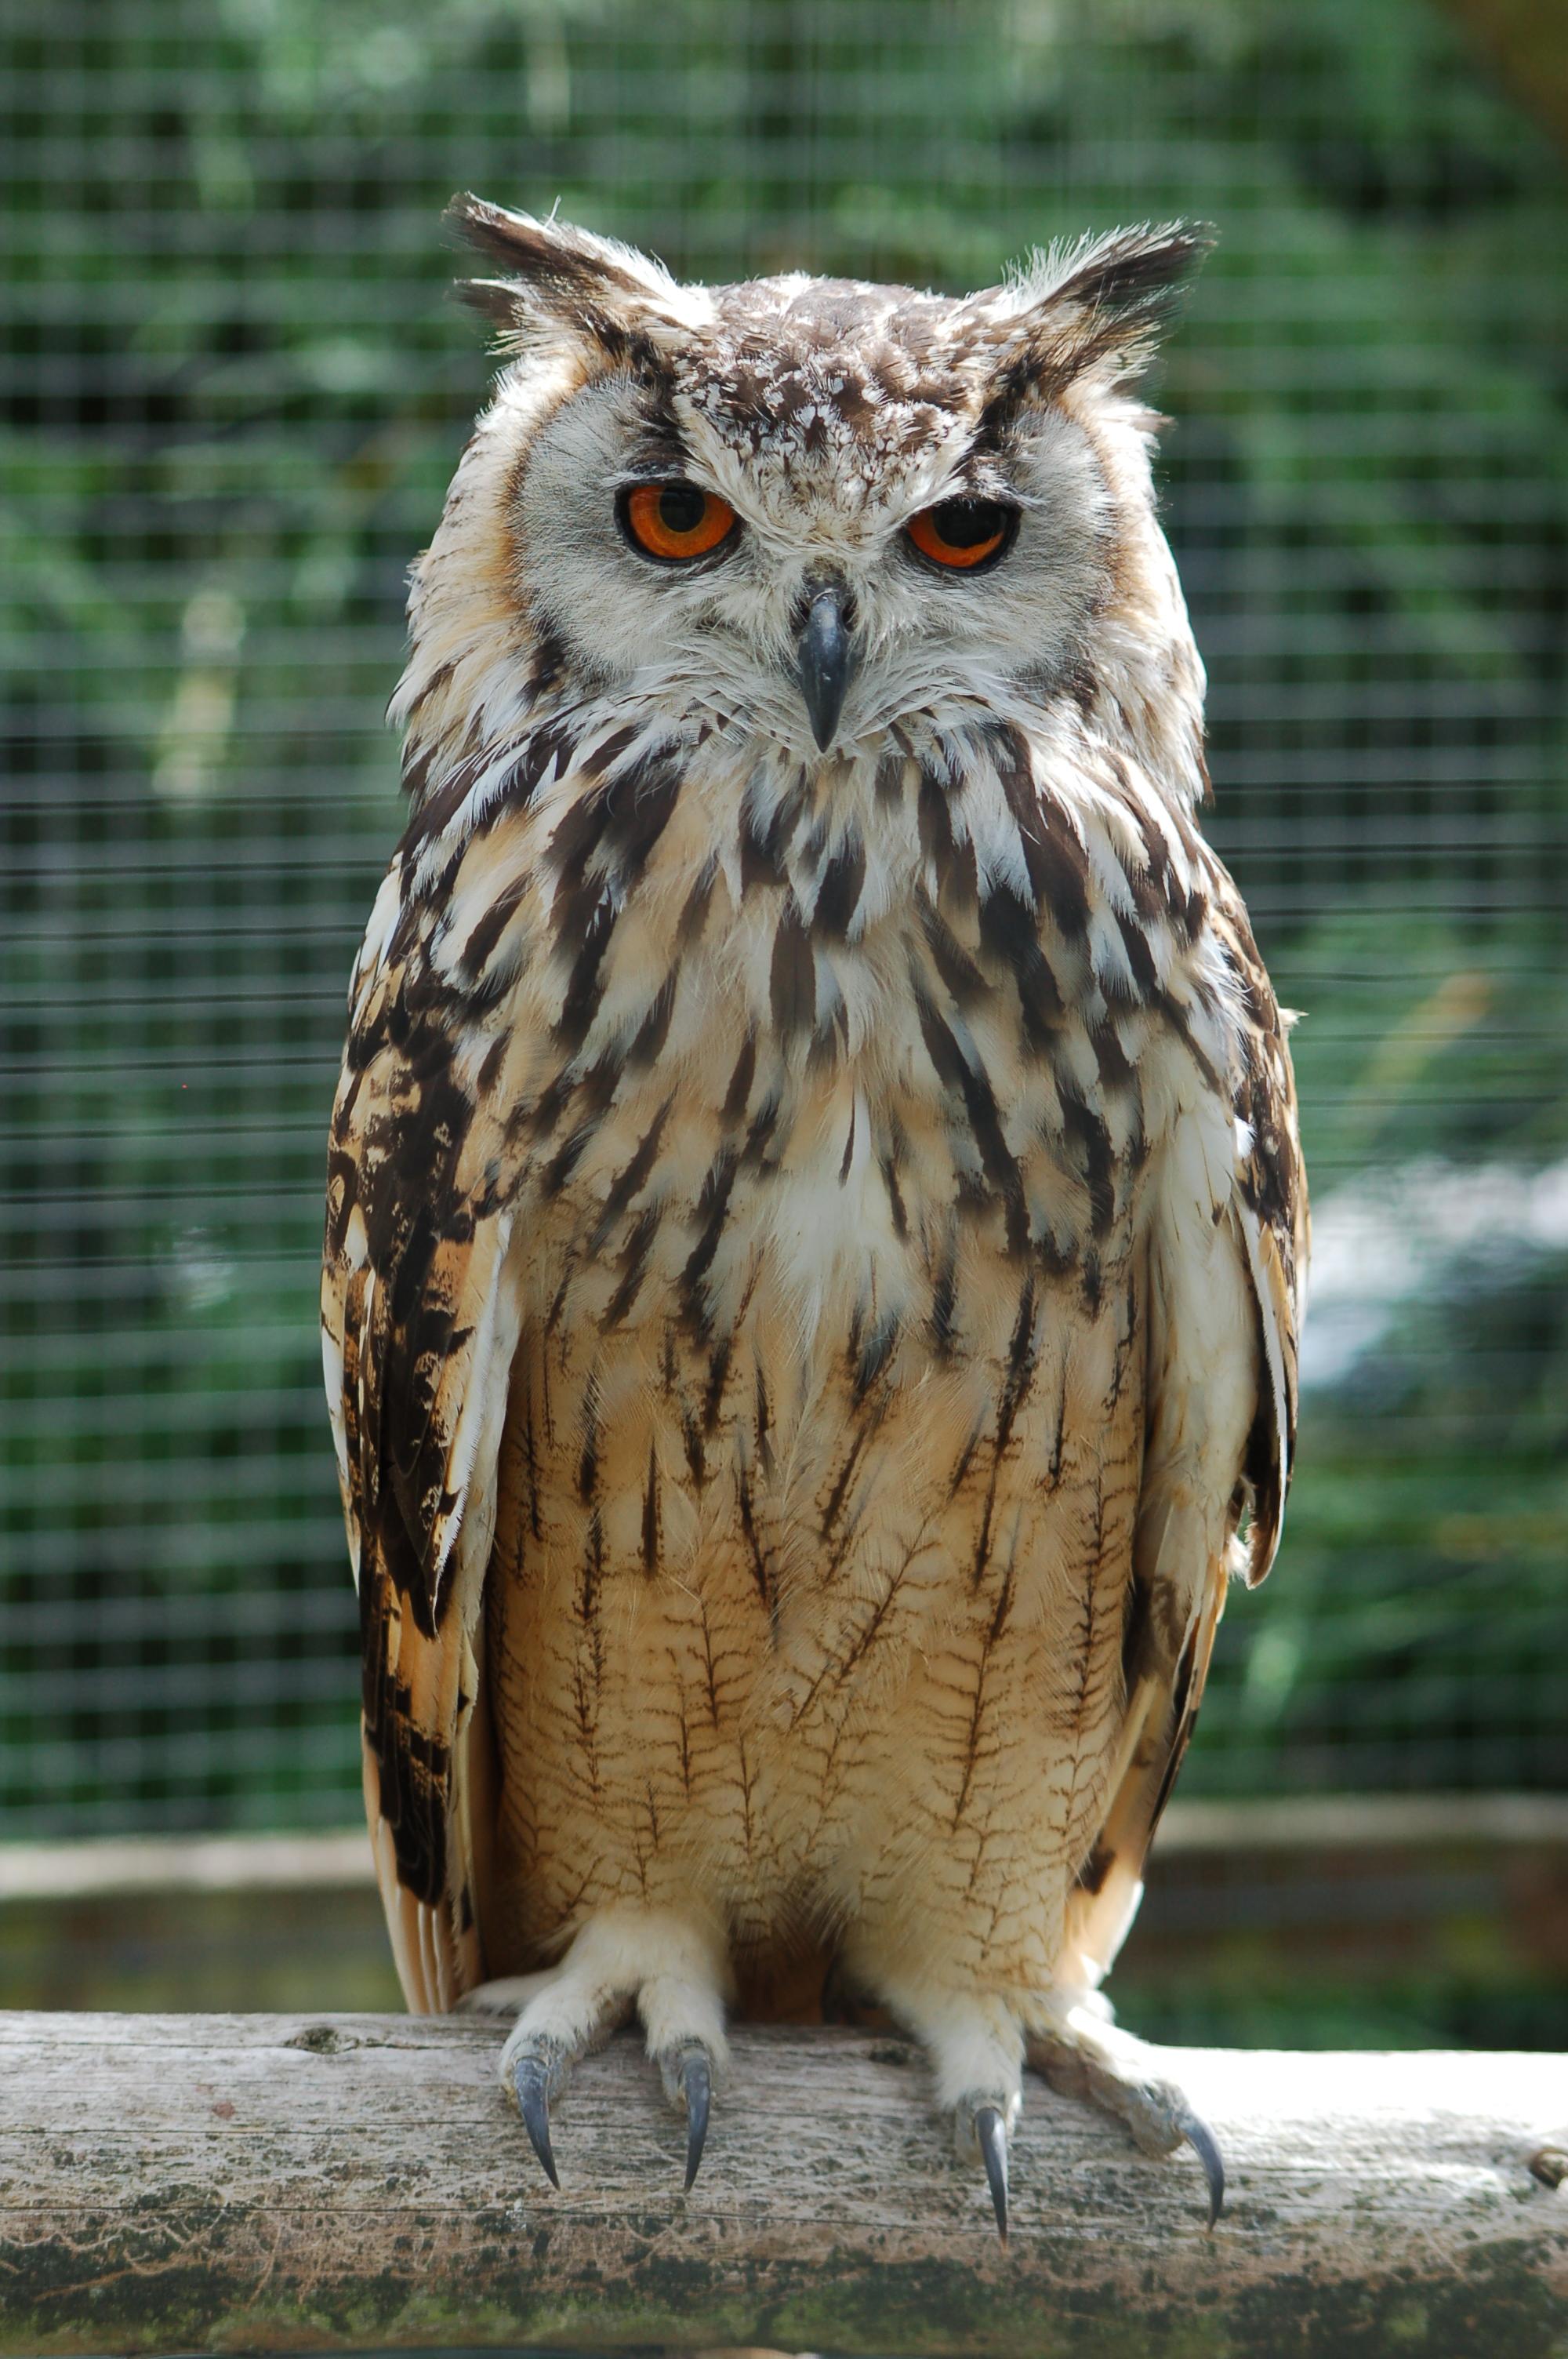 https://upload.wikimedia.org/wikipedia/commons/b/b2/Bengalese_Eagle_Owl.jpg